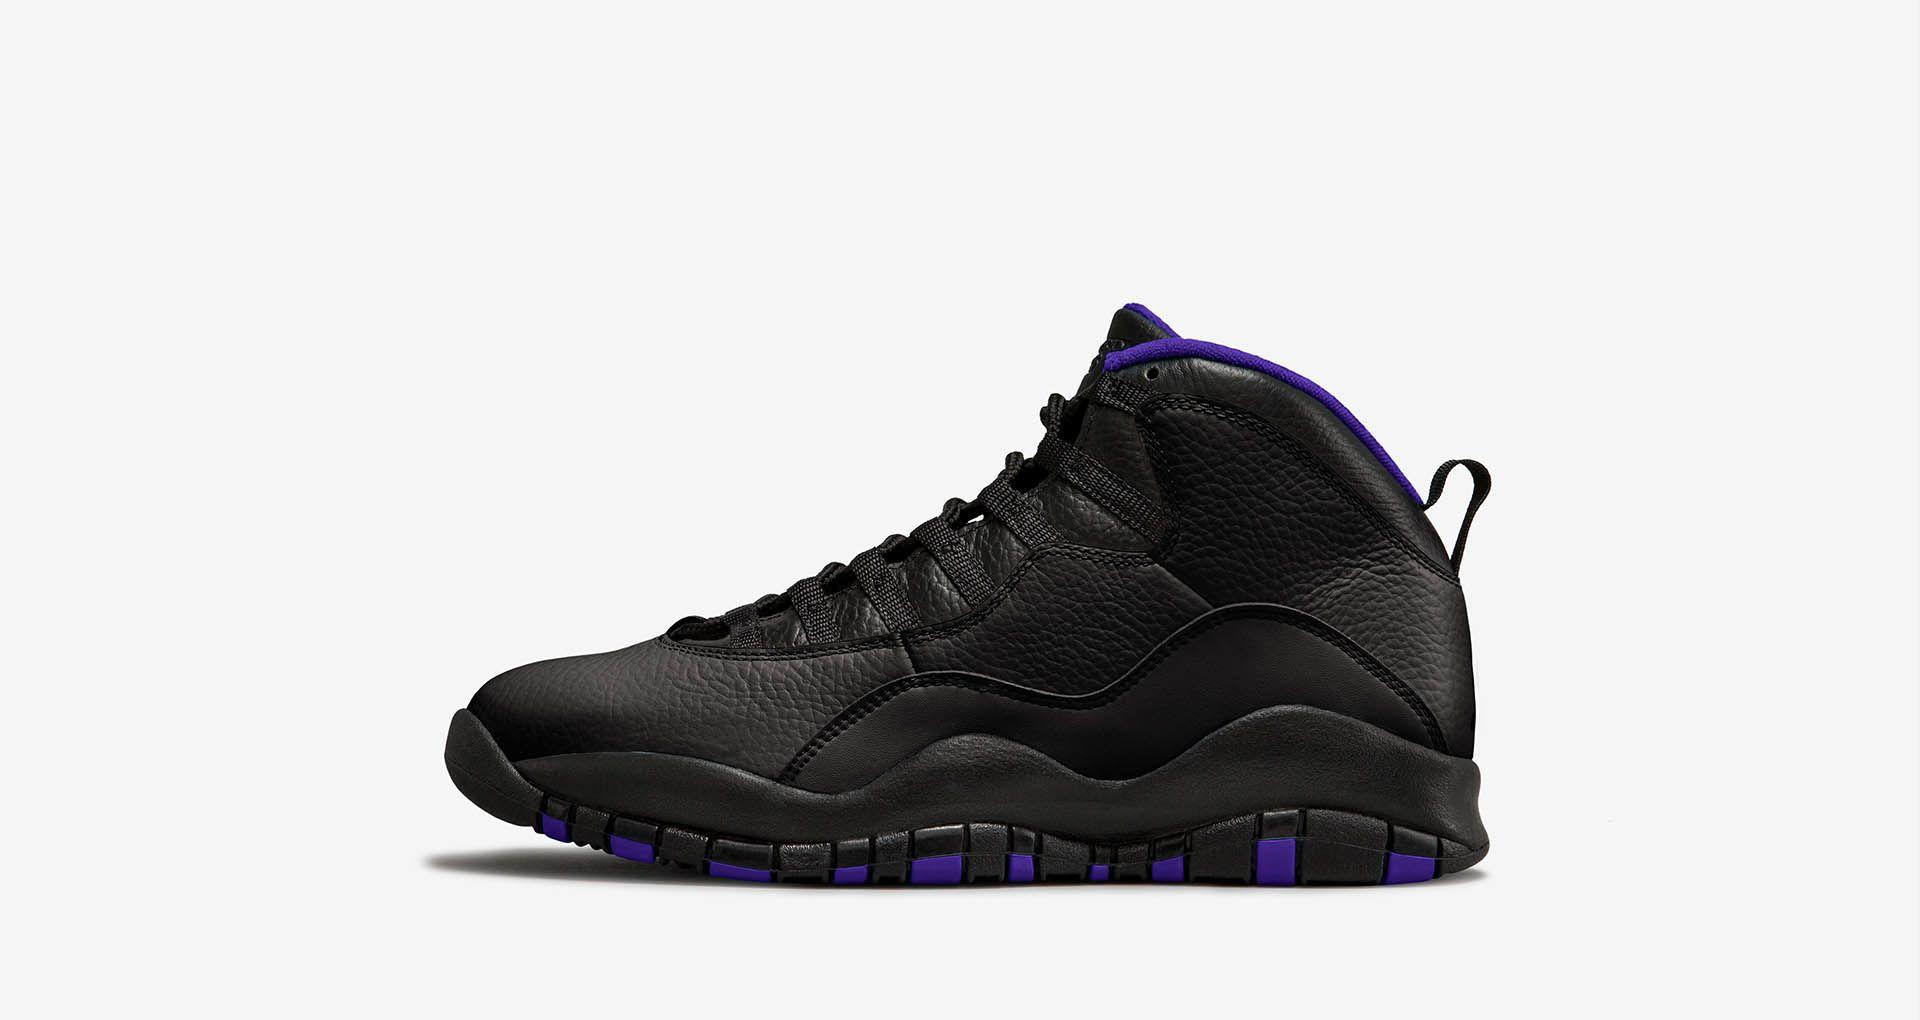 competitive price c9233 1cc8b Inside the Vault: Jordan 10 x City Series. Nike+ SNKRS